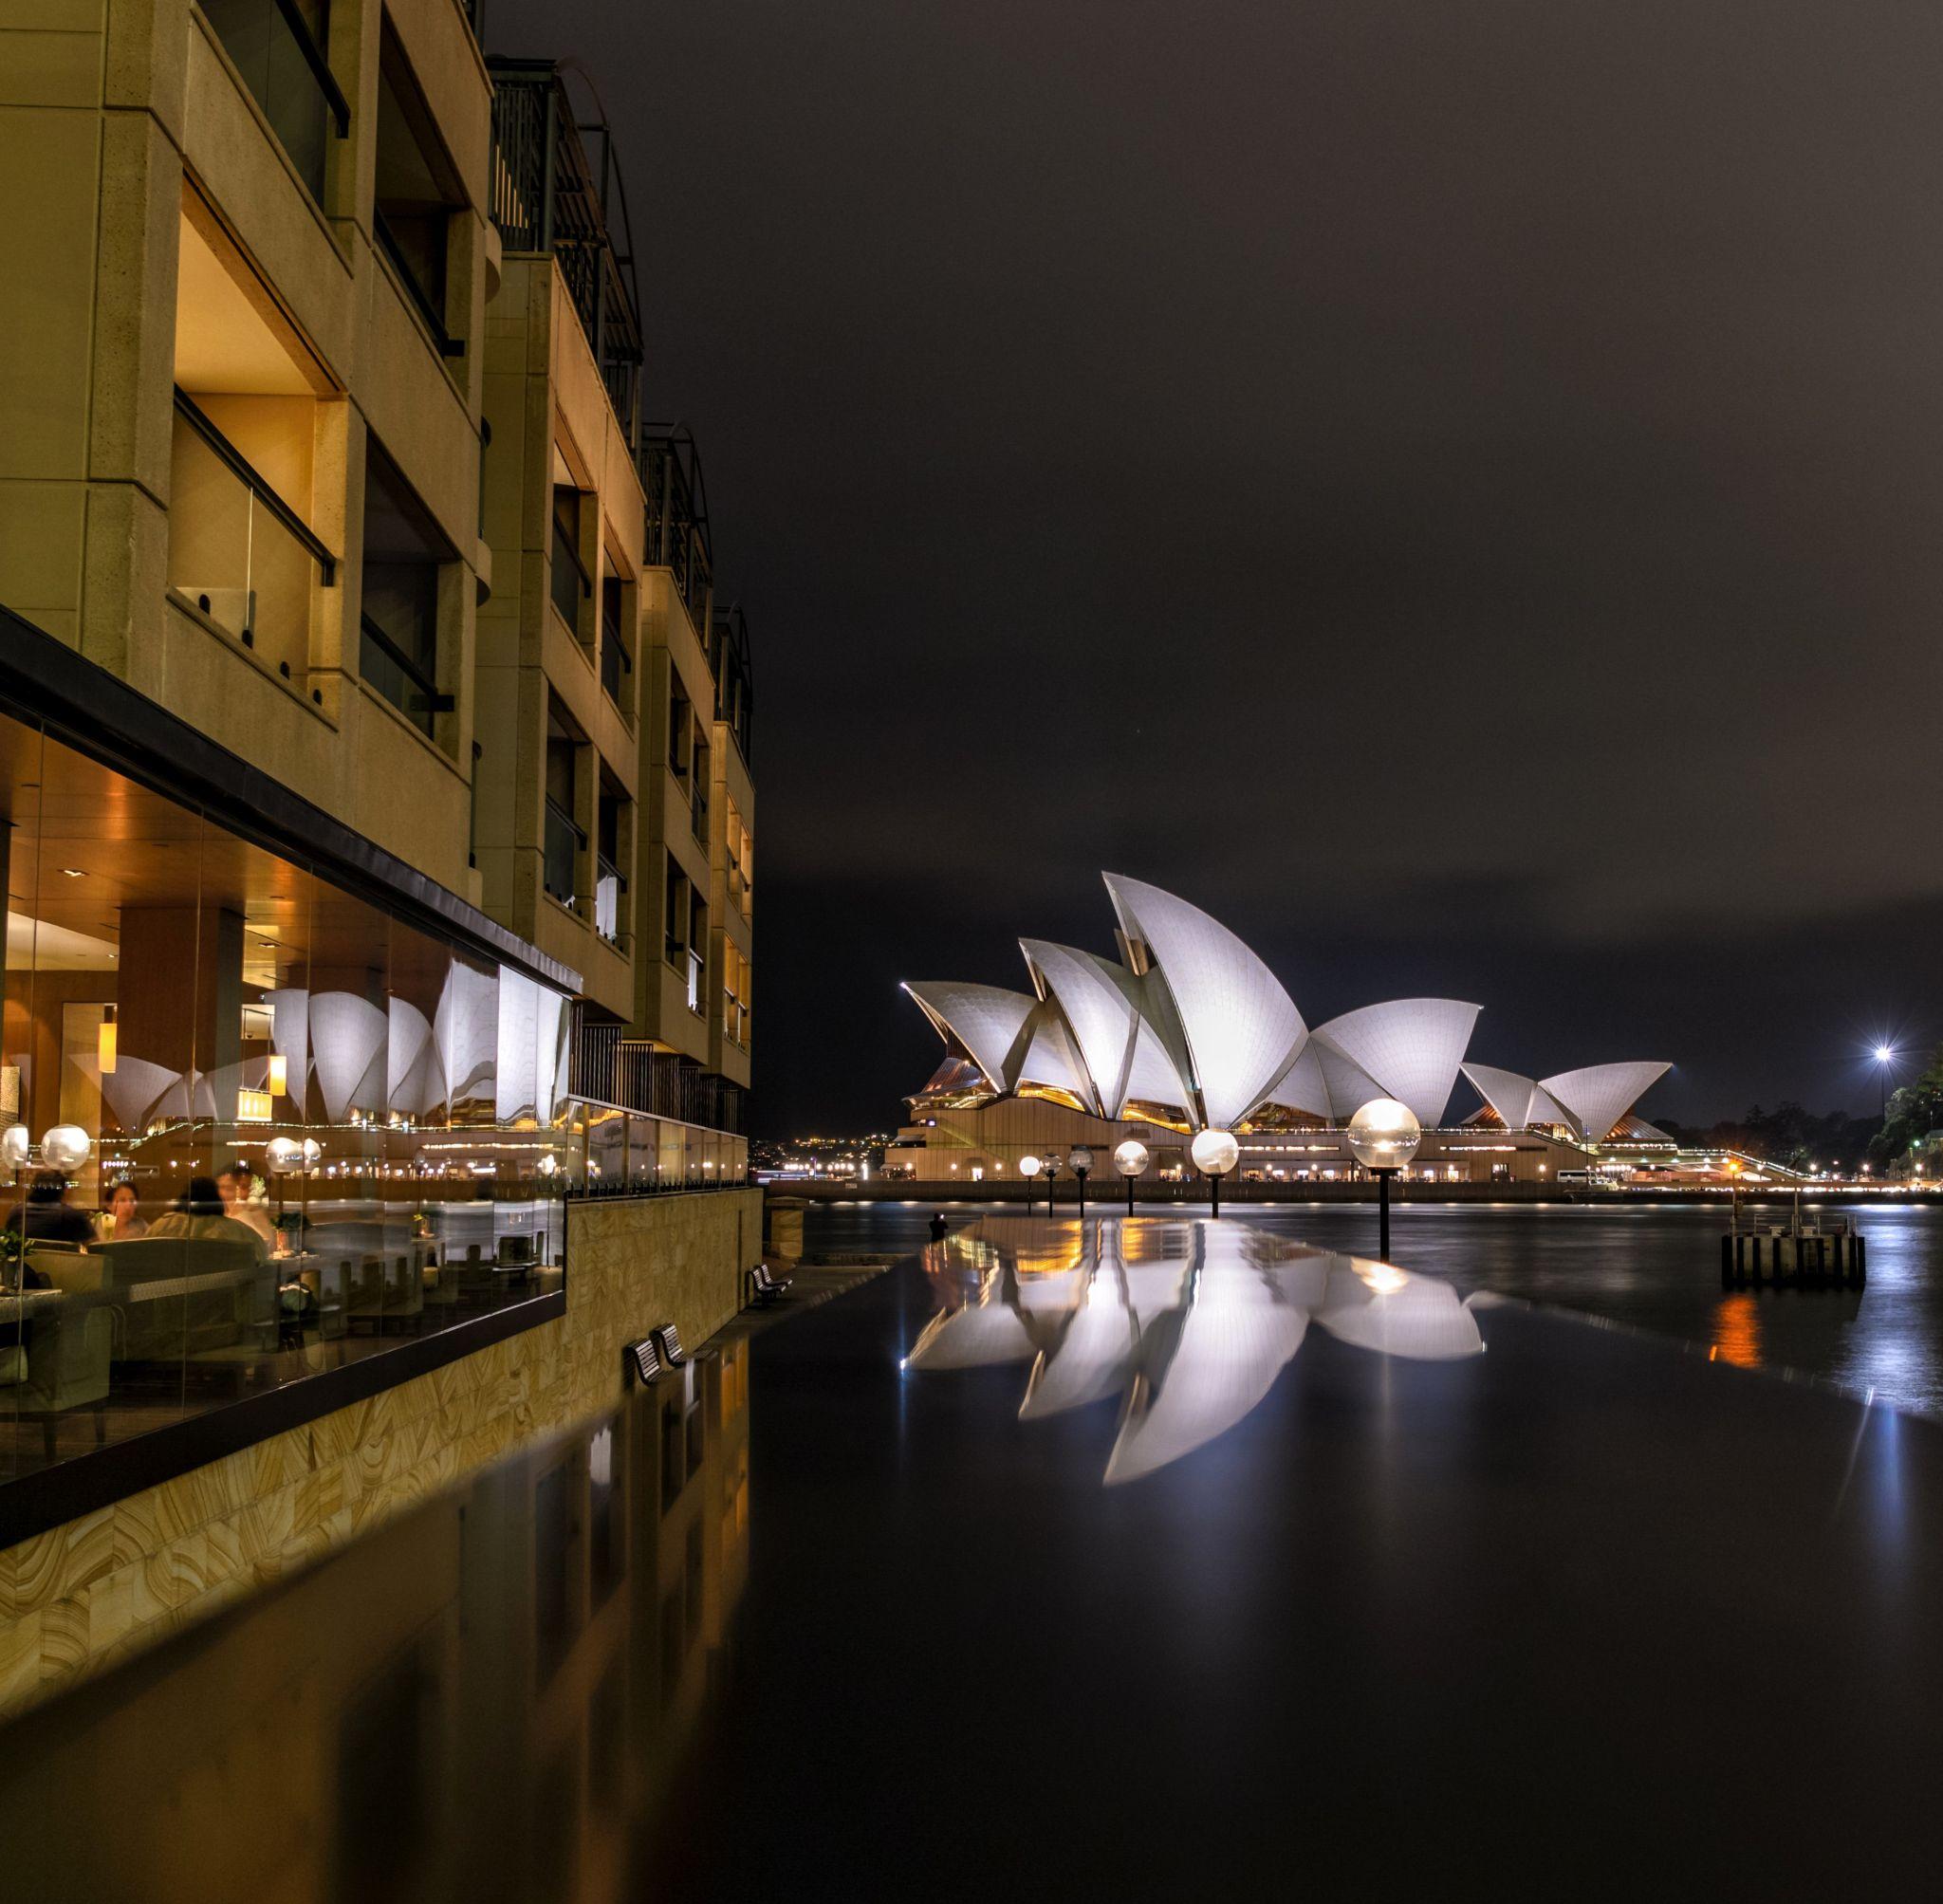 Park Hyatt Sydney Hotel, Australia